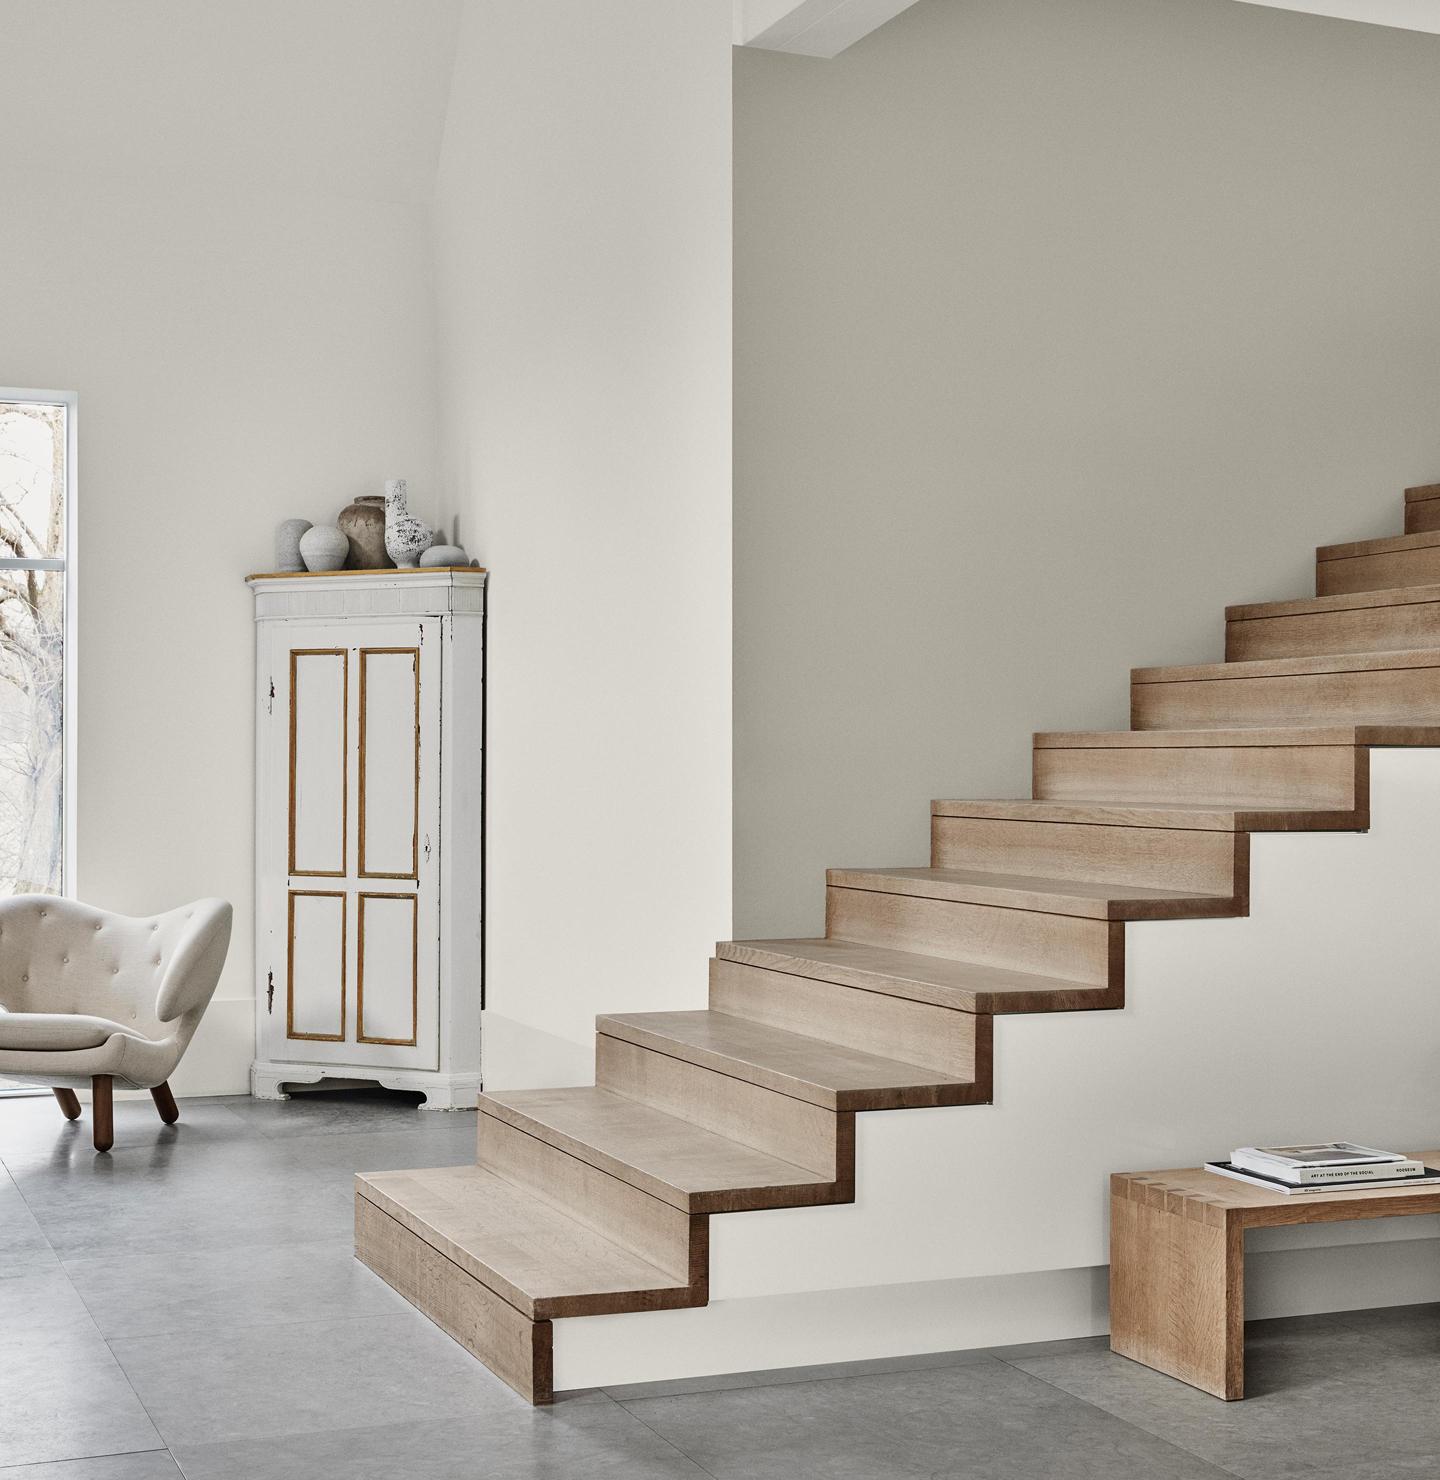 'Comfort Grey' from Jotun (Stairway Wall), IMAGE CREDIT: Jotun